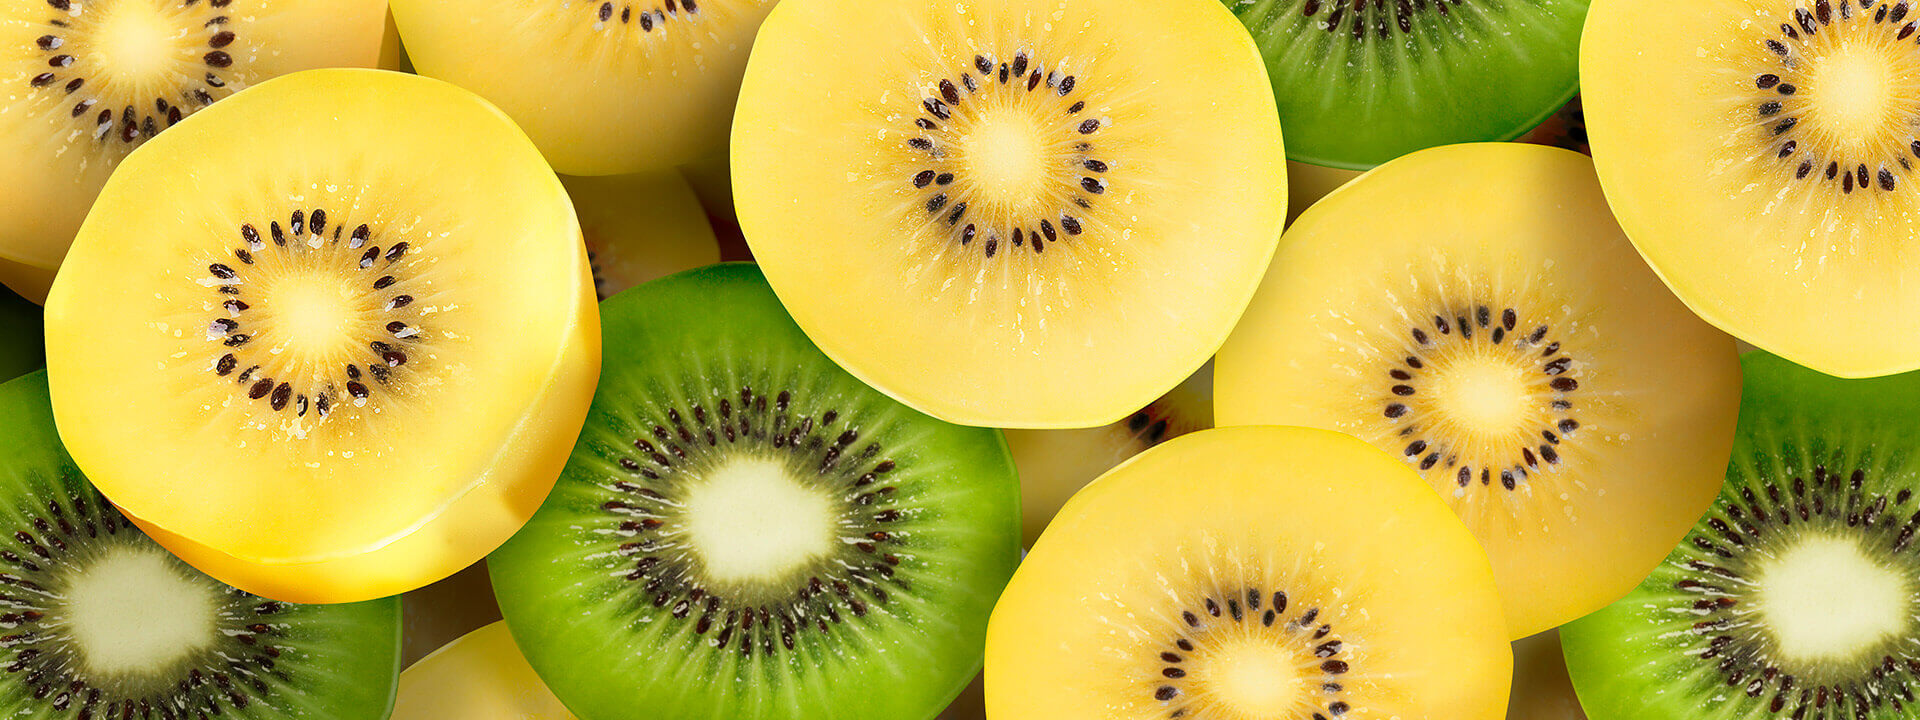 Pictures Of Golden Kiwi Fruit